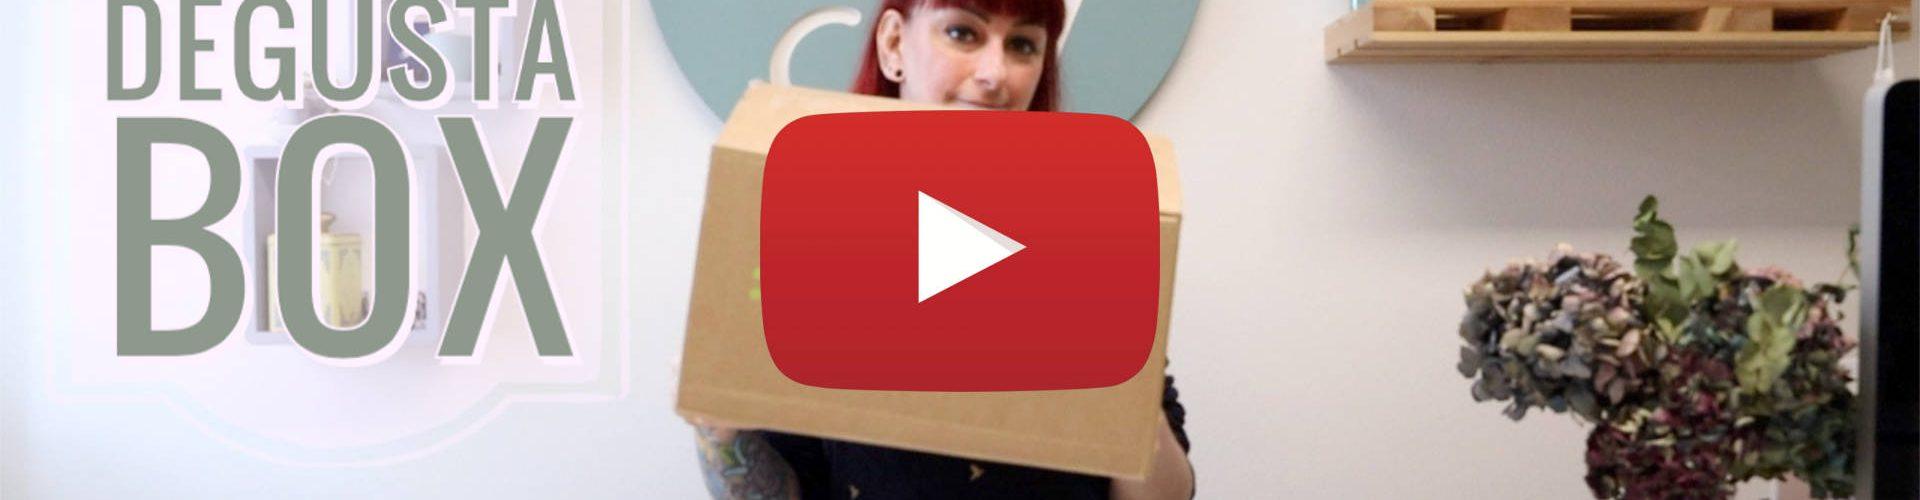 Unboxing degusta box février 2020